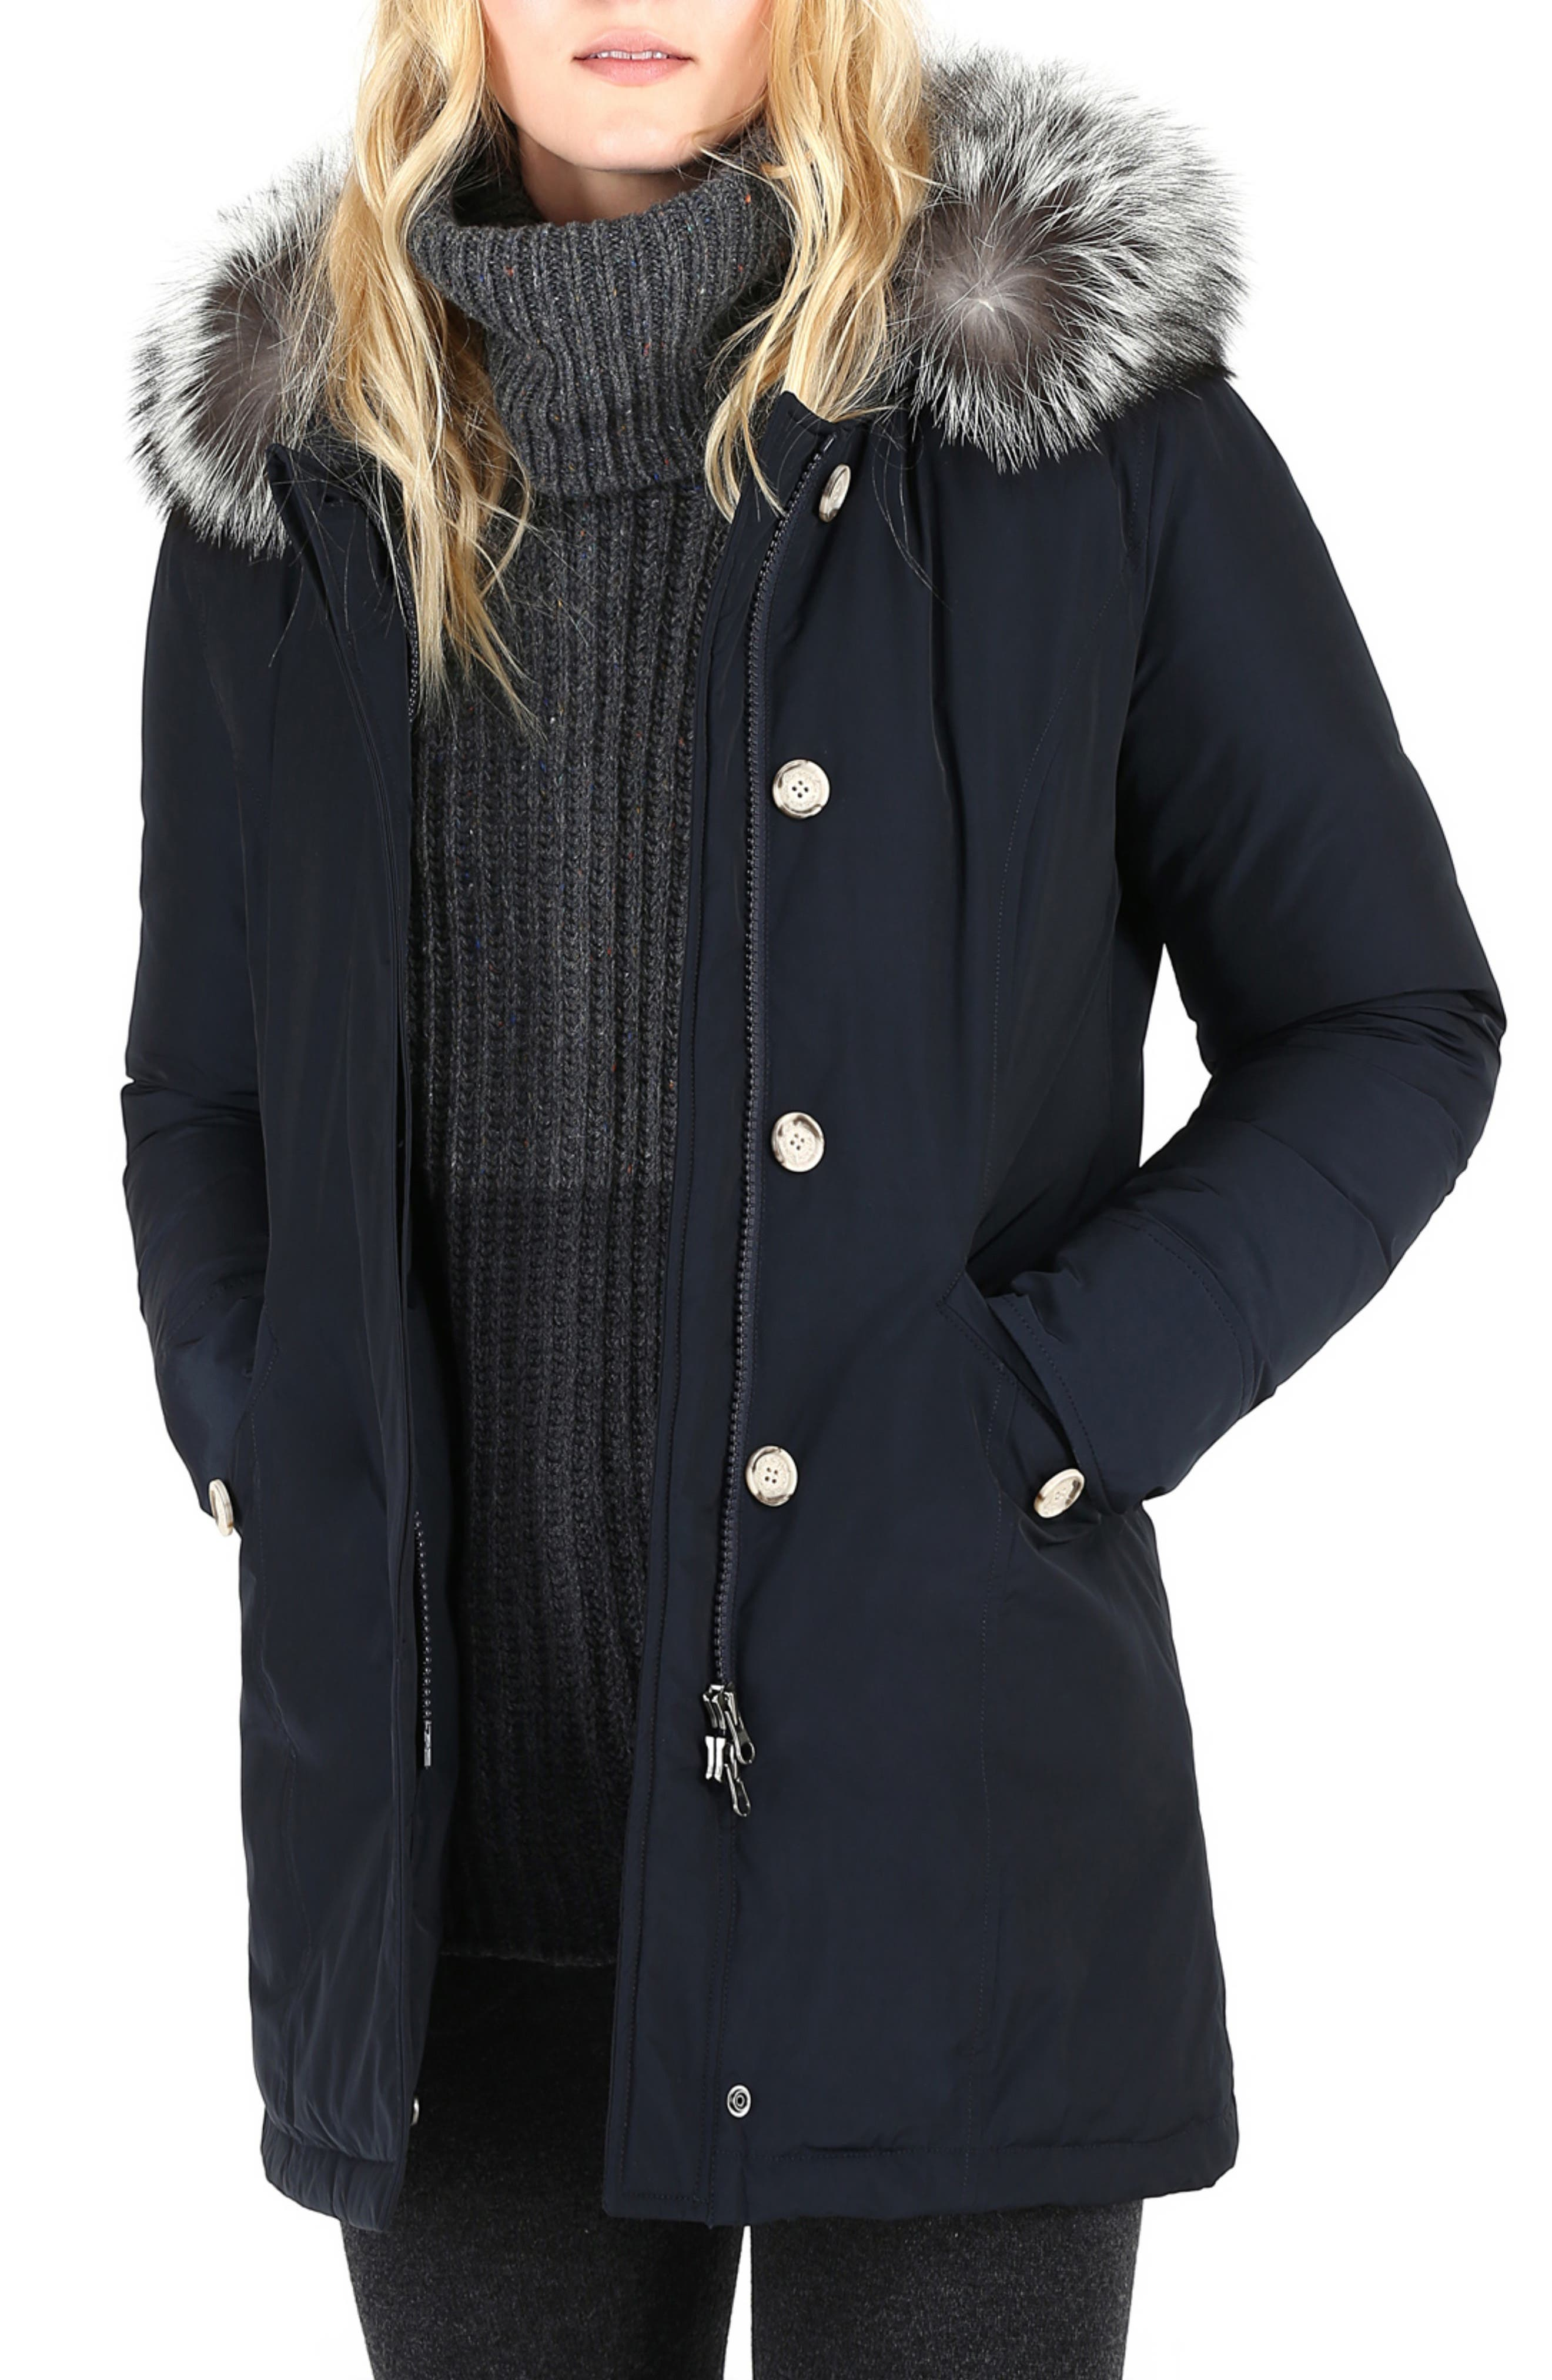 Luxury Arctic Down Parka with Genuine Fox Fur Trim,                             Main thumbnail 1, color,                             MIDNIGHT BLUE